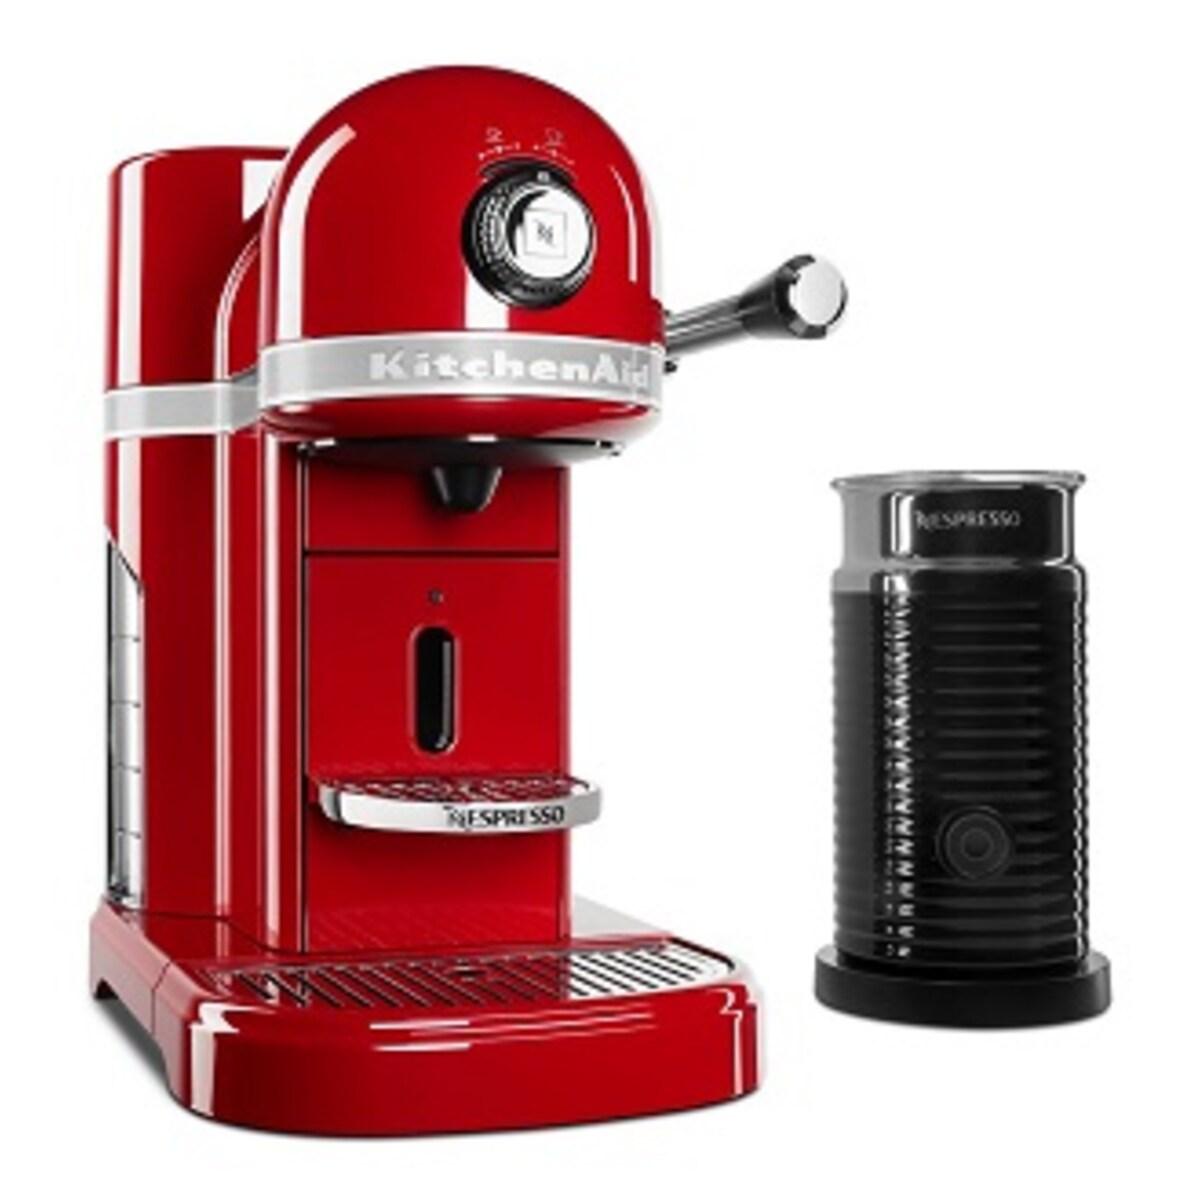 Nespresso Kitchen Aid Empire Red със система за мляко